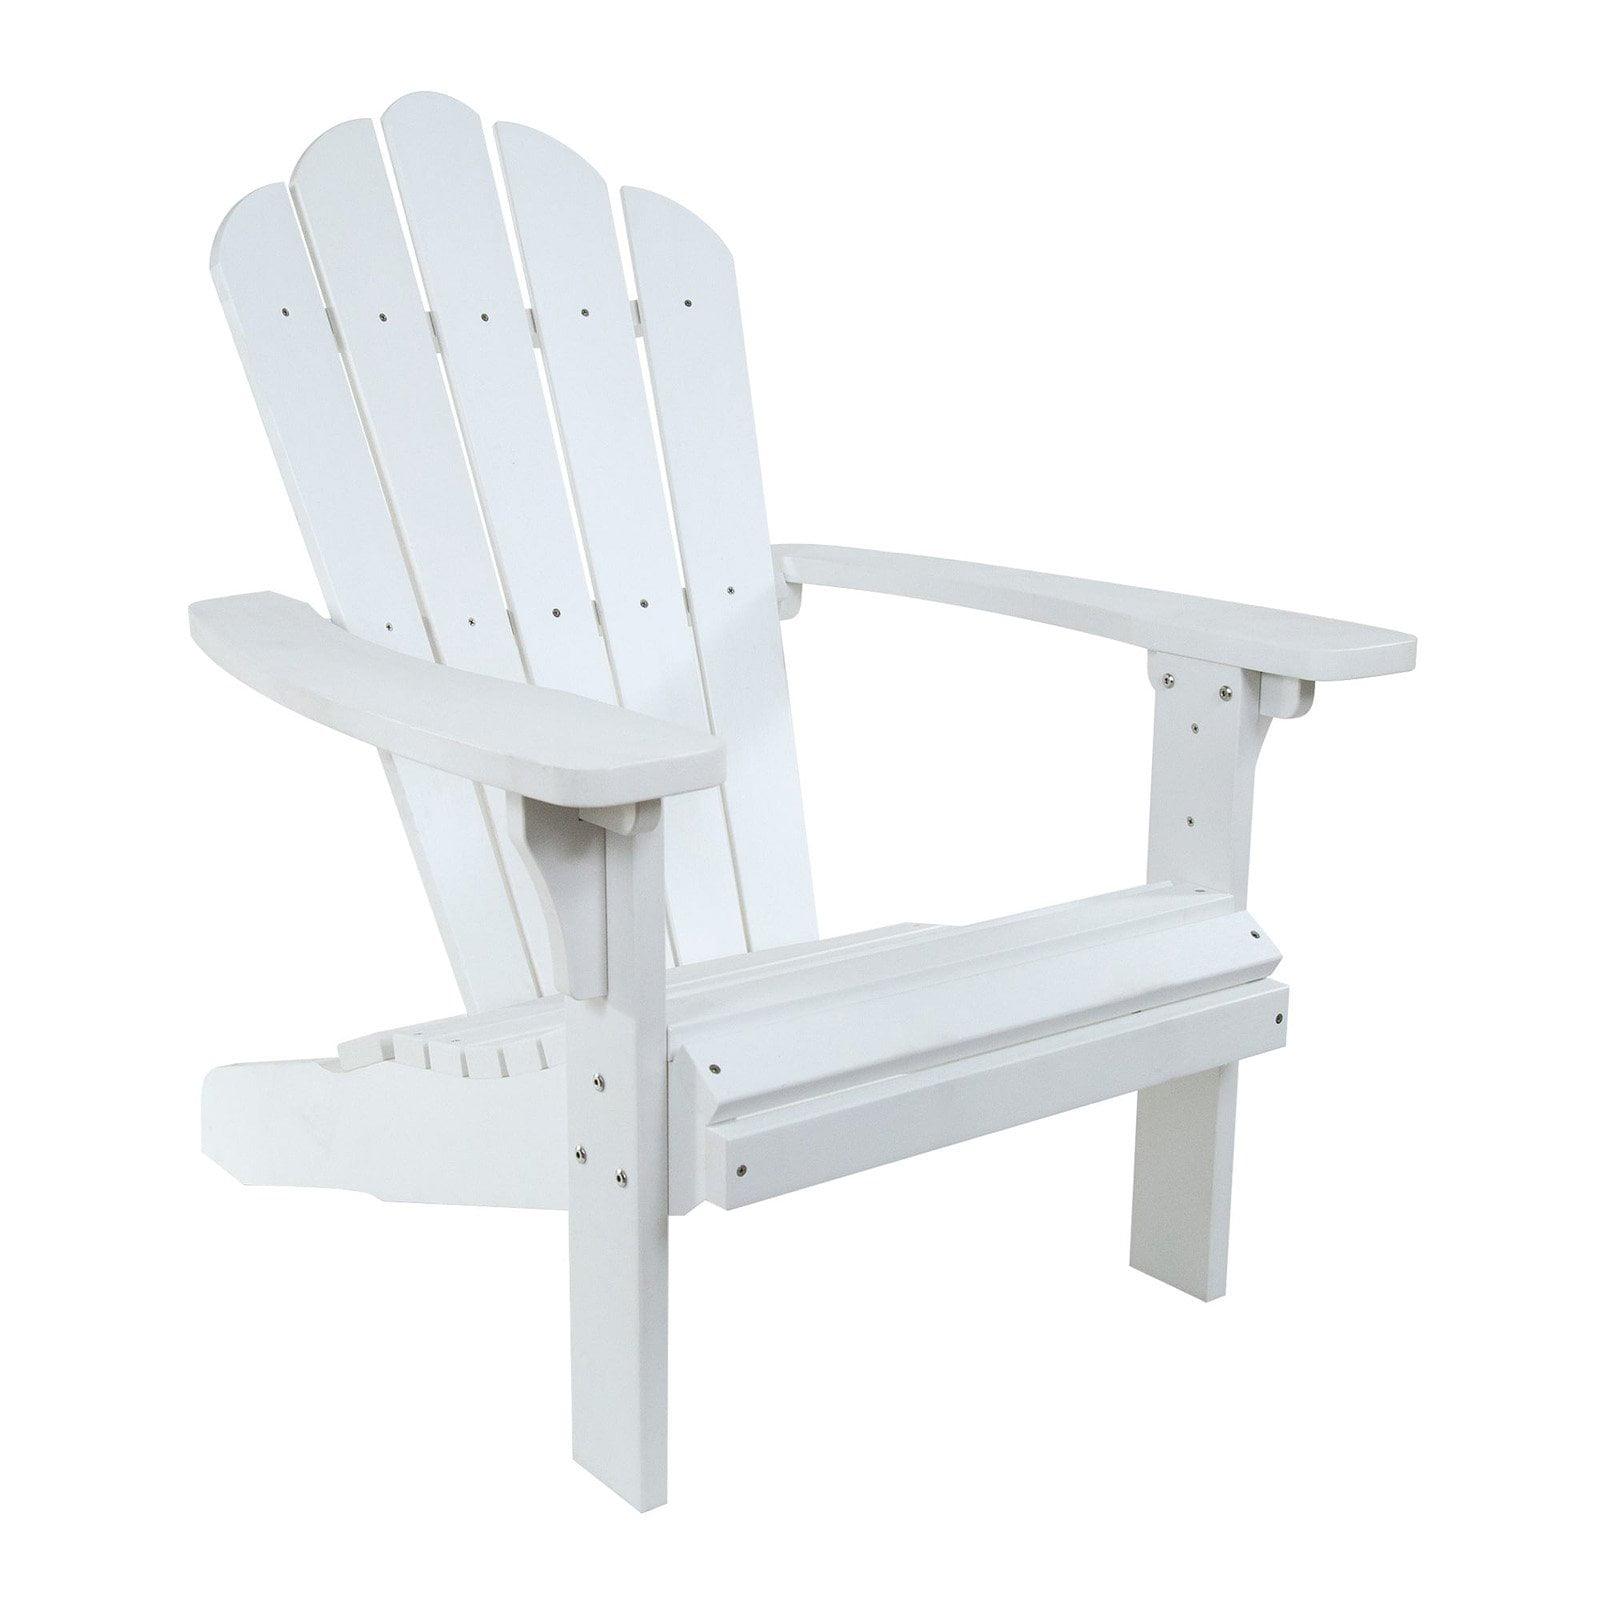 West Palm Plastic Adirondack Chair White by Shine Company